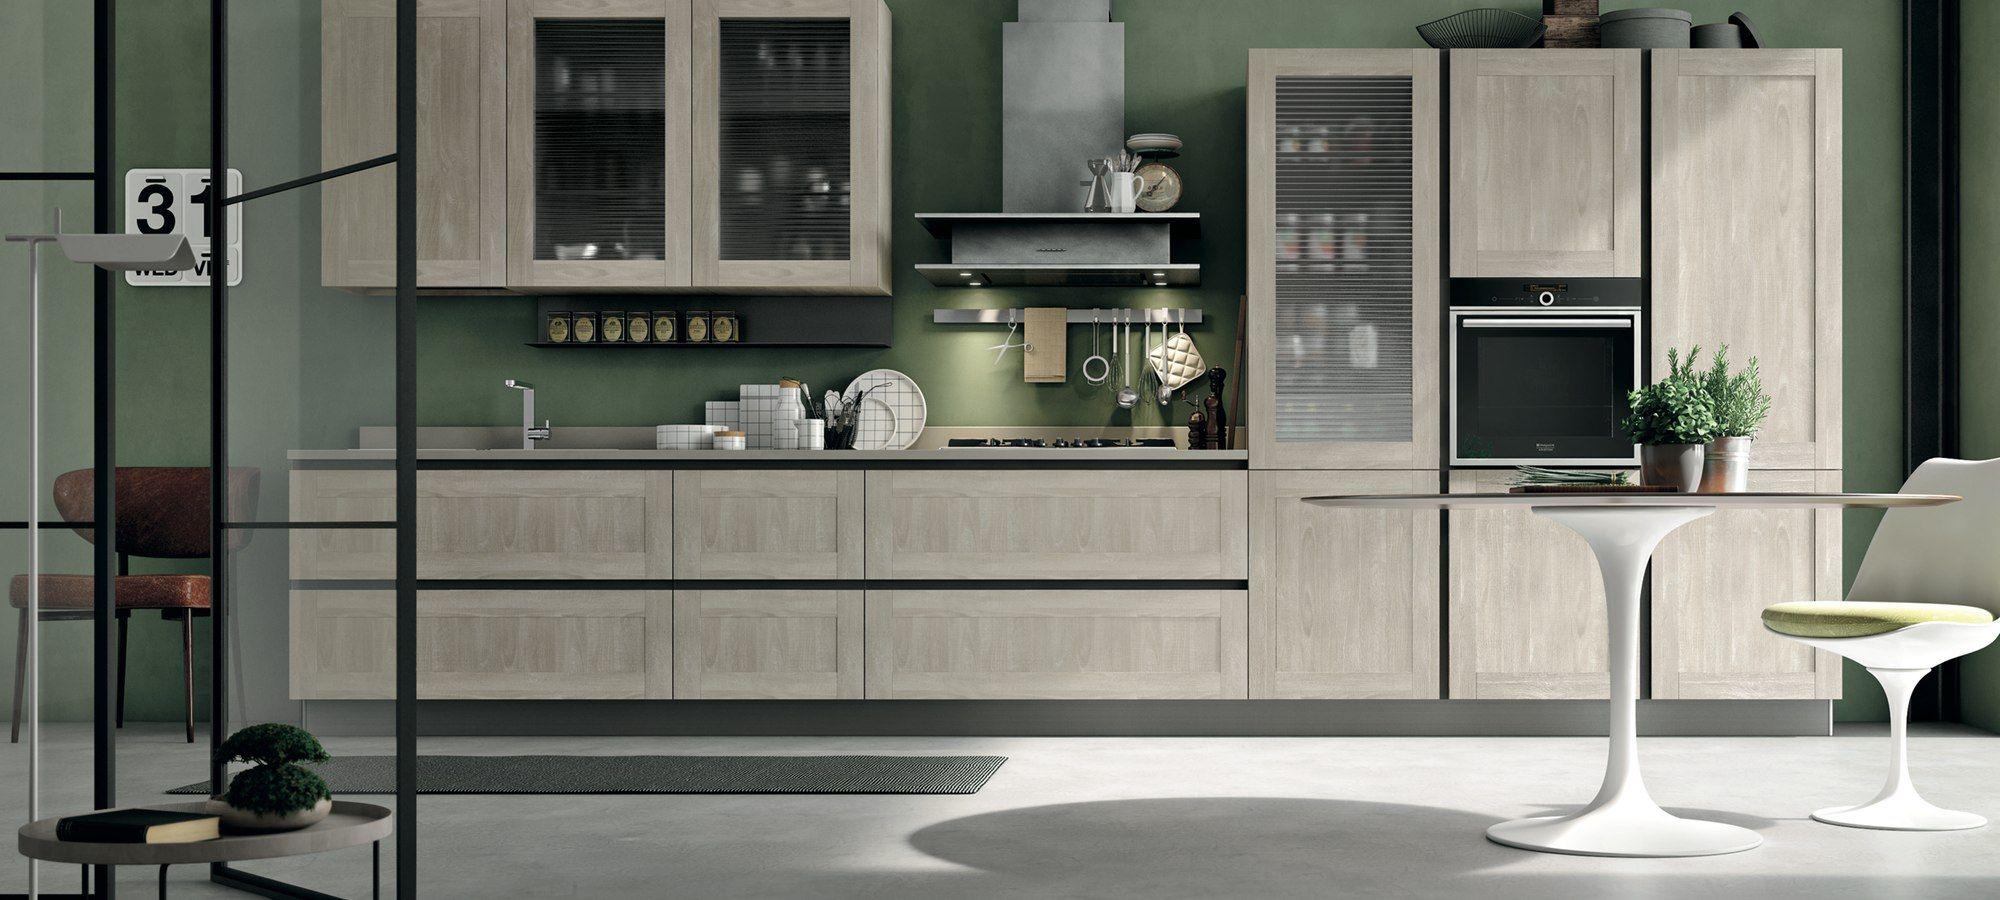 Cucine Moderne Stosa.Cucine Moderne Stosa Modello Cucina City 05 Arredamento